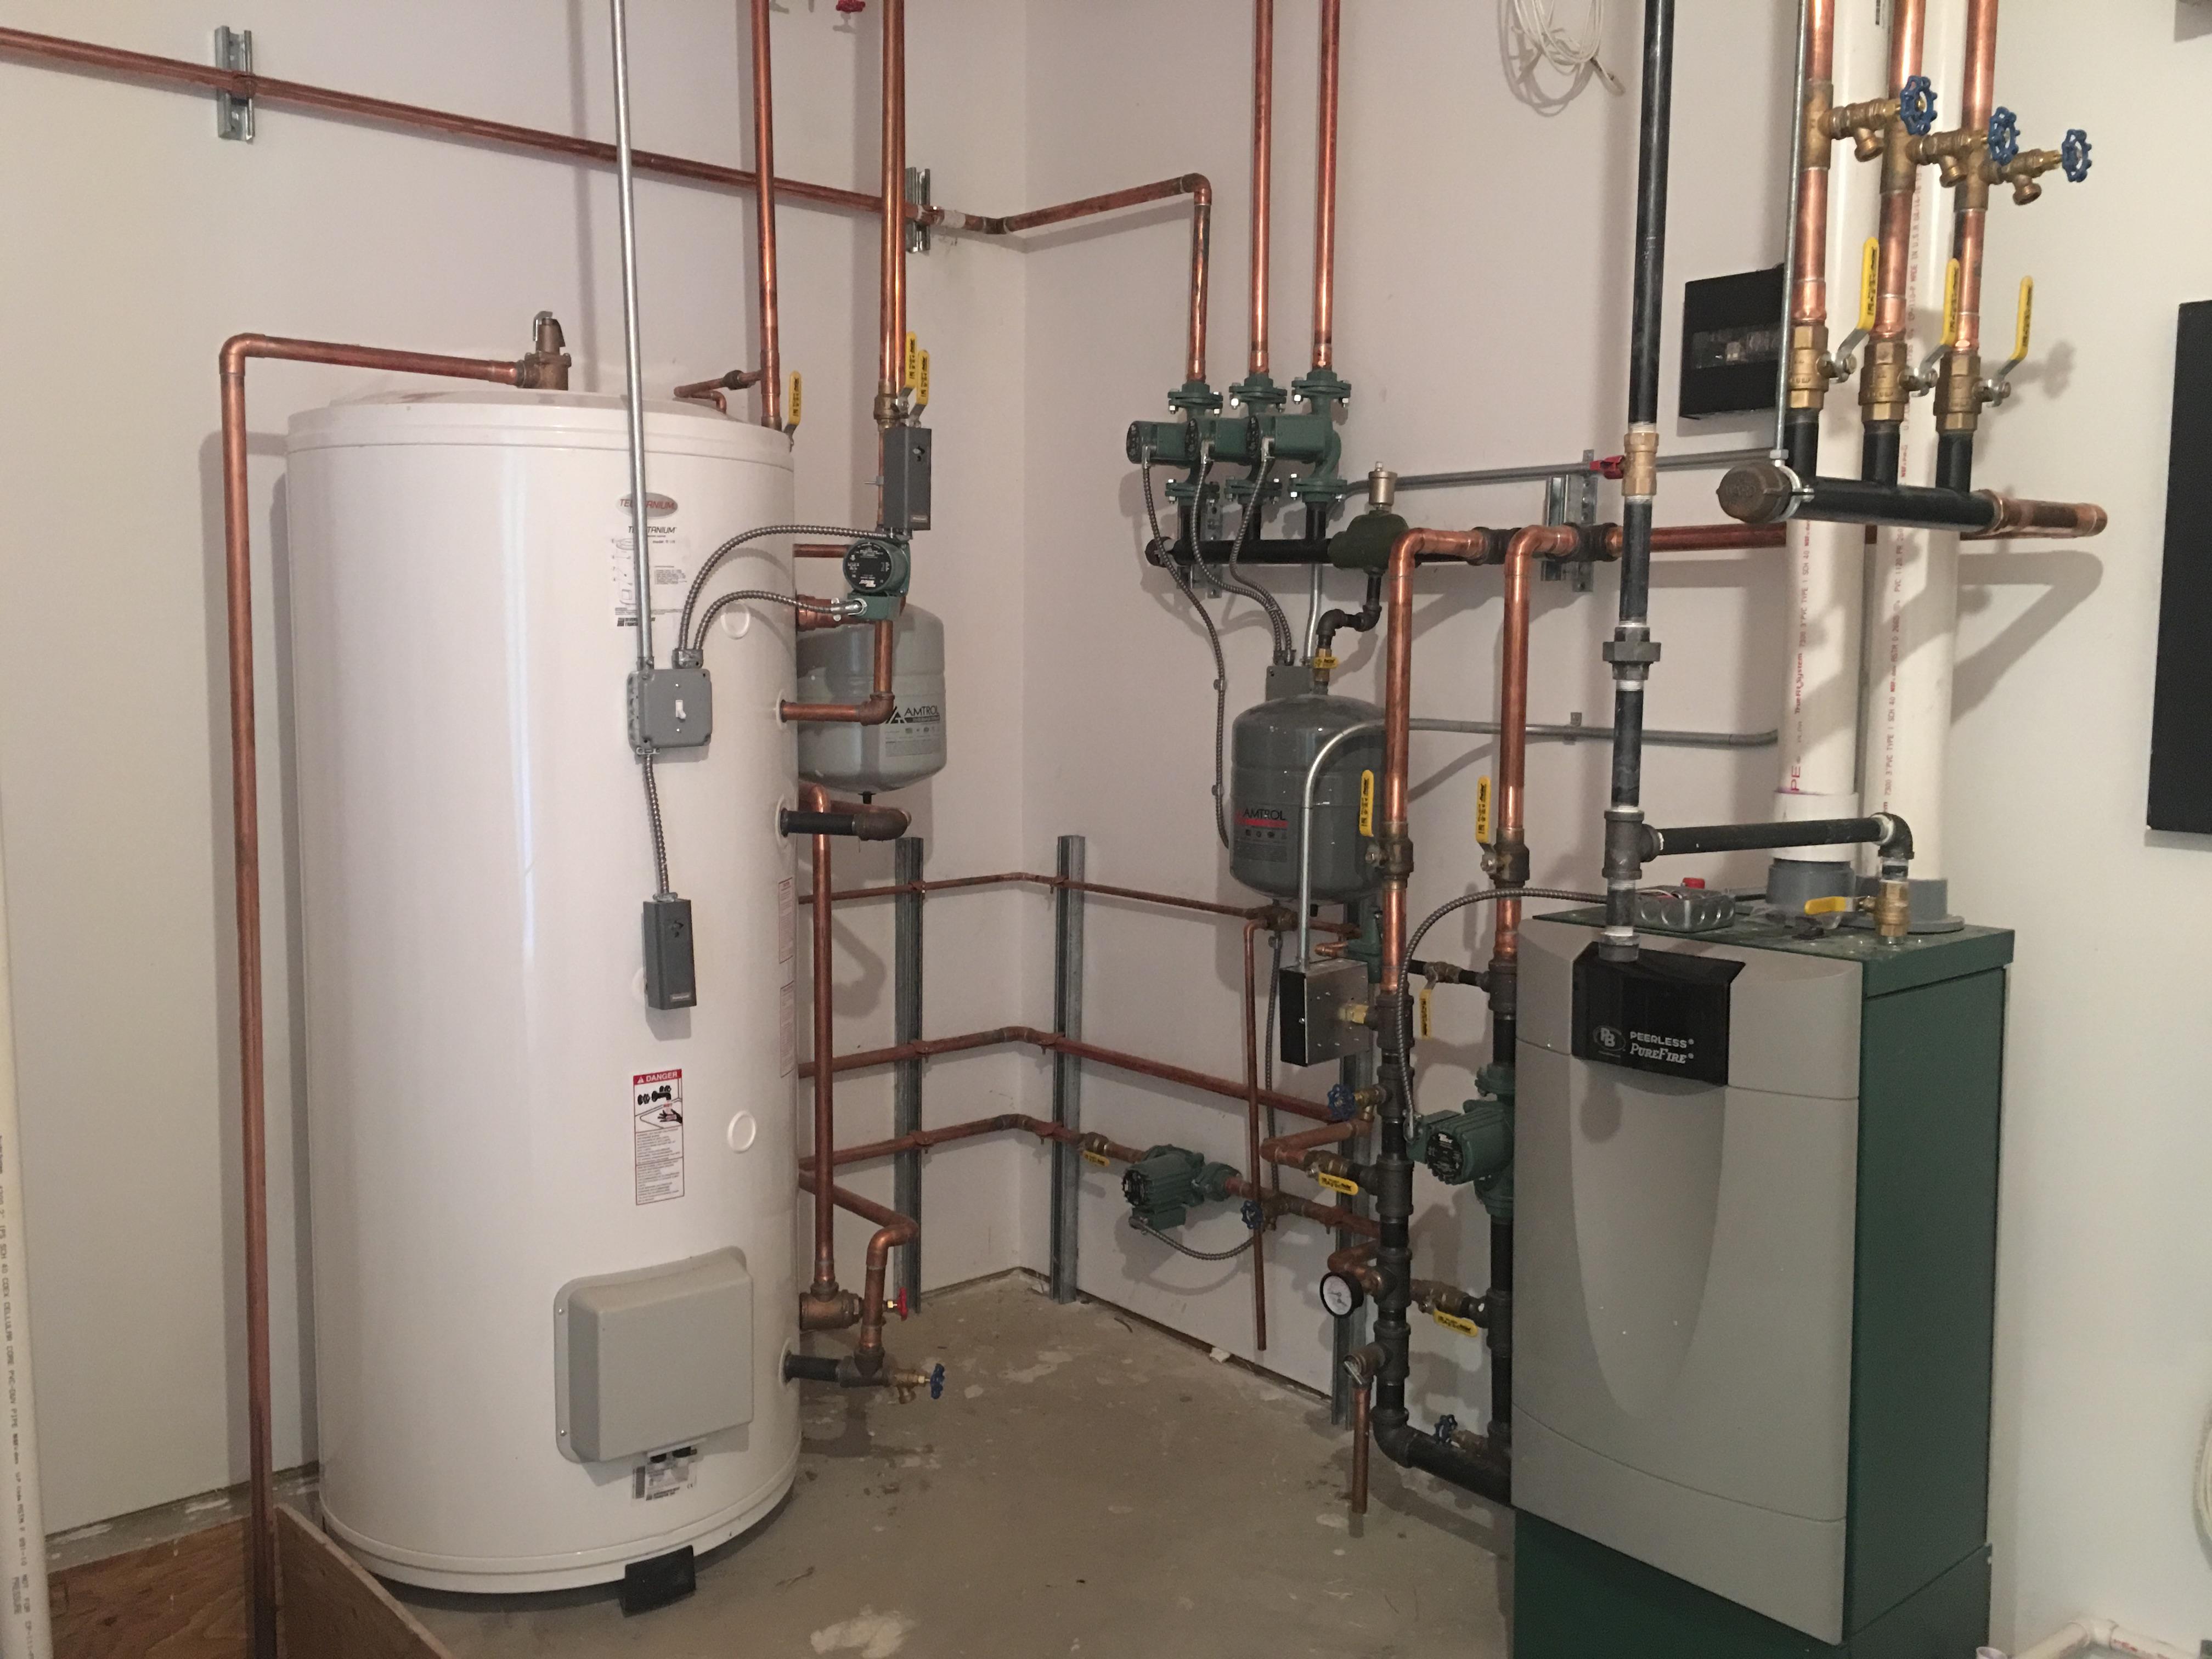 Rehm Plumbing, Heating, HVAC, Air Conditioning & Electrical image 2